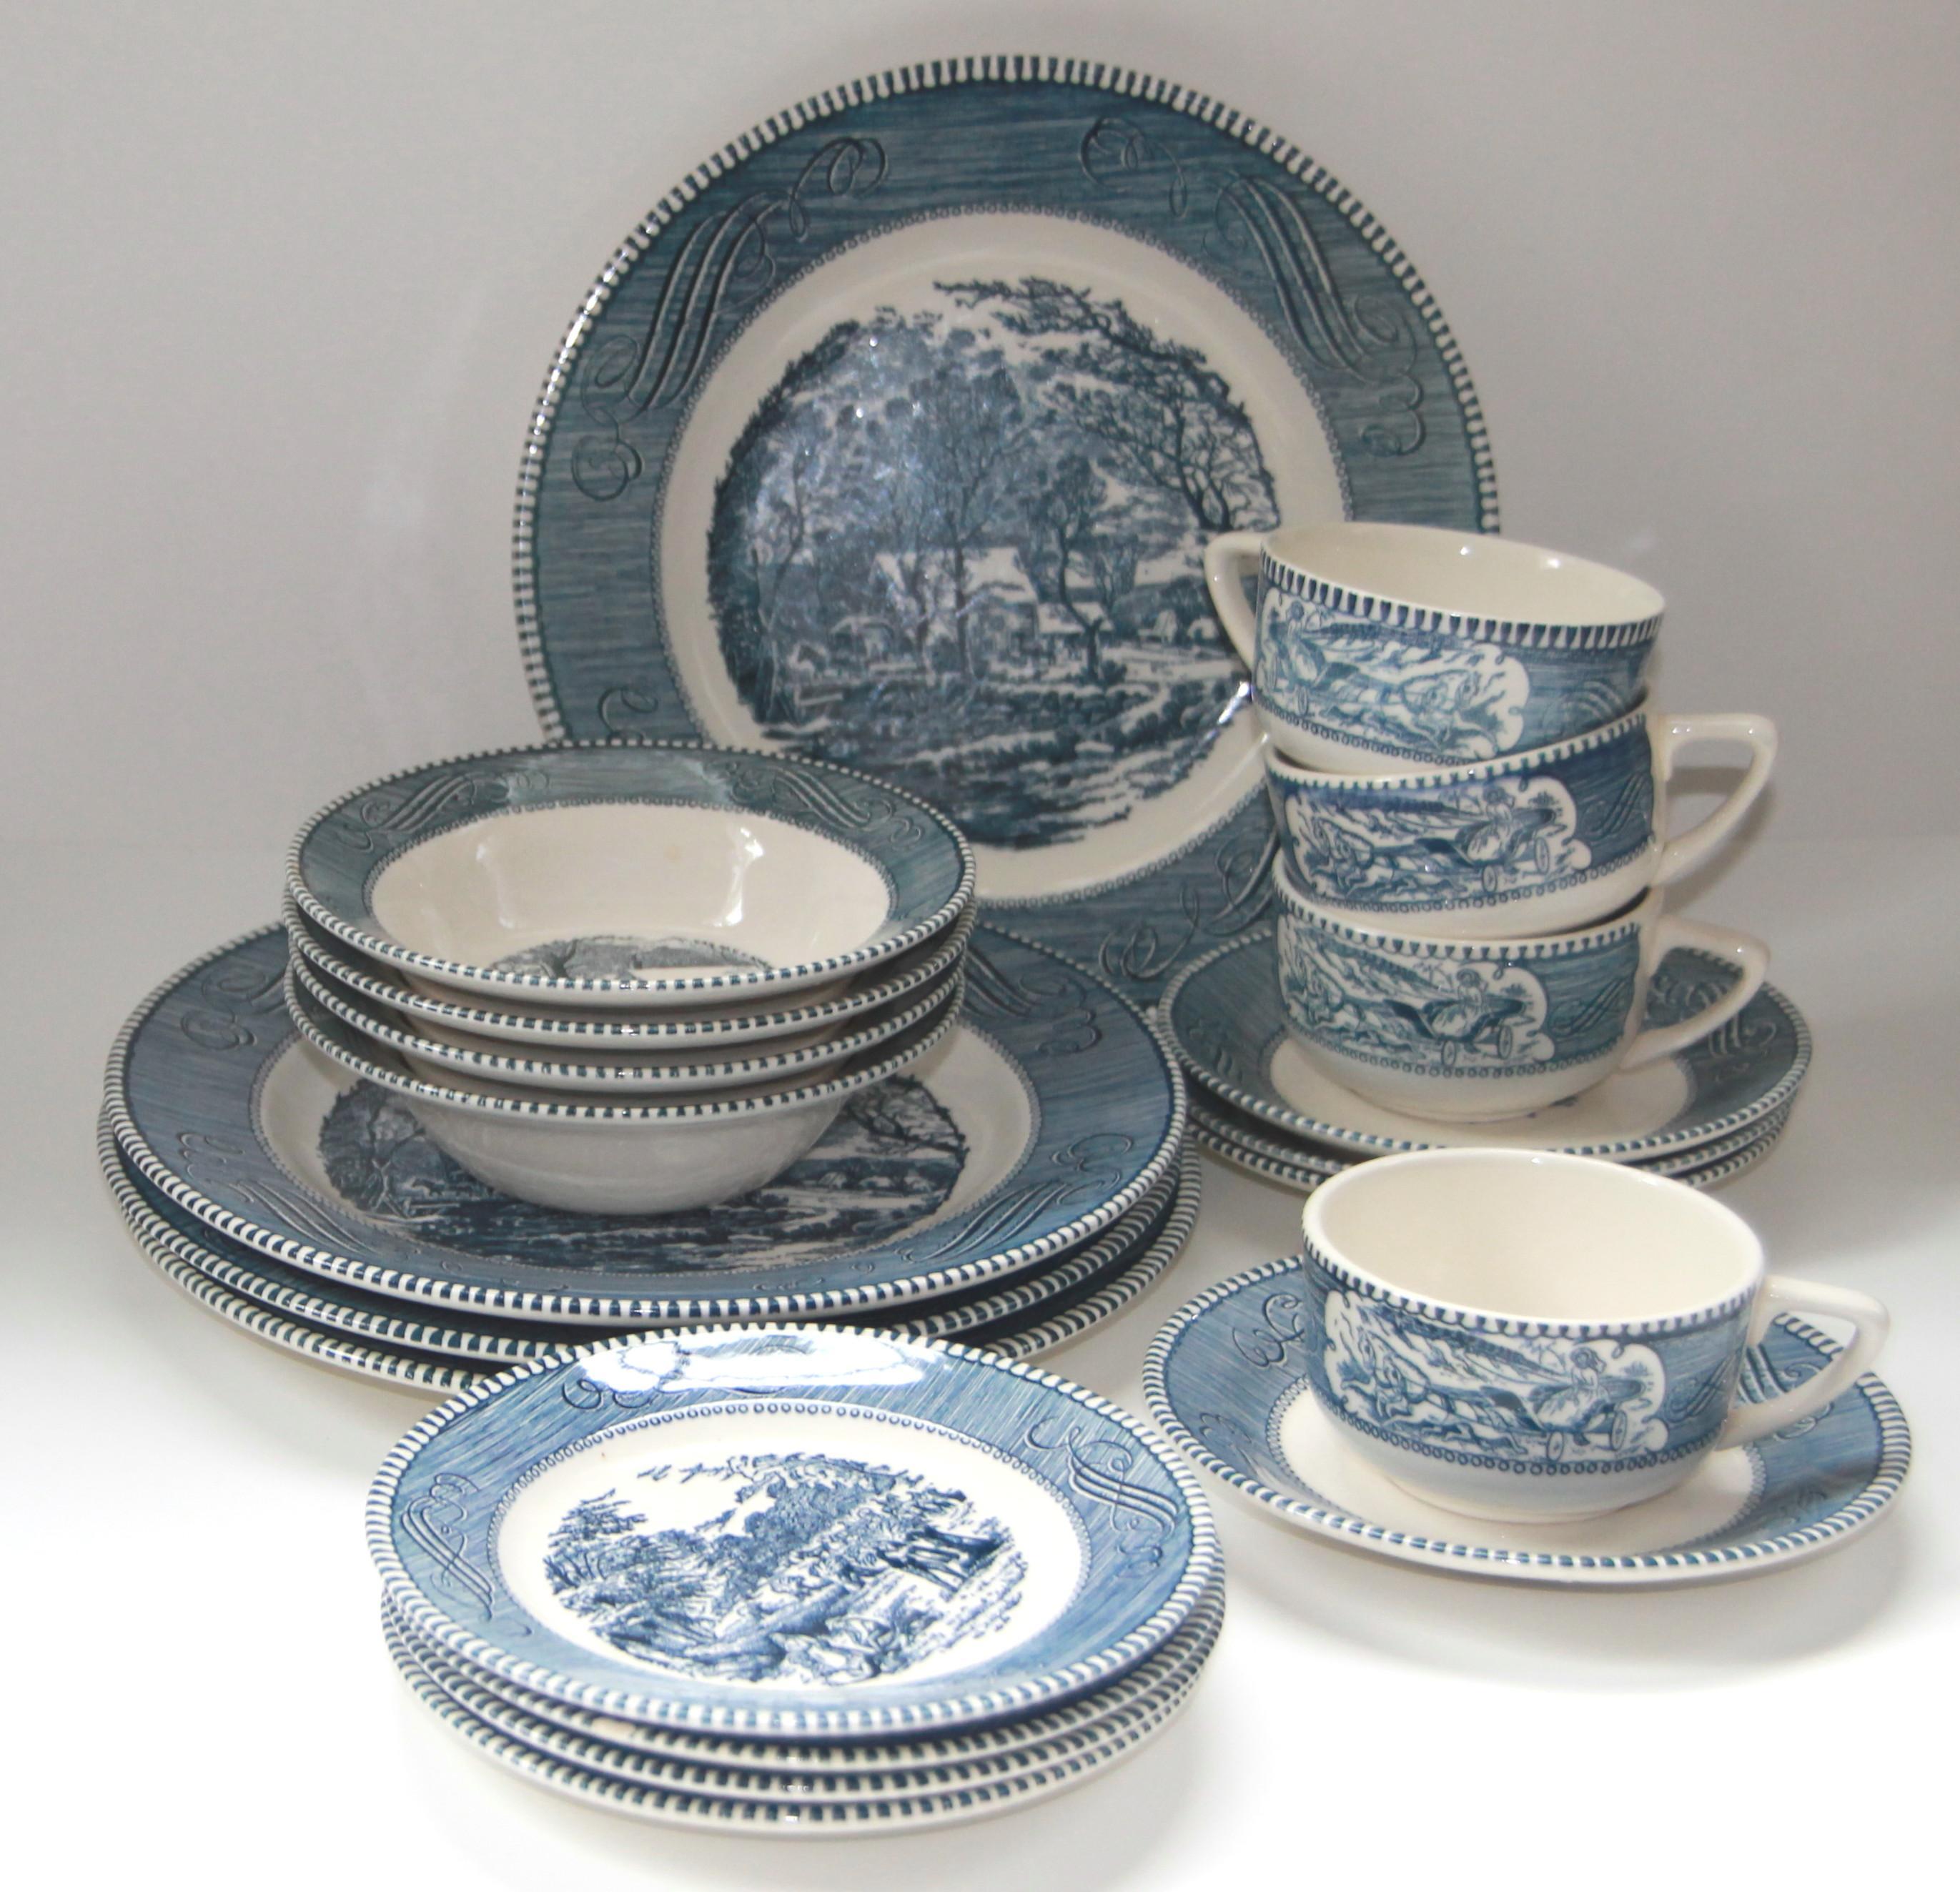 Currier u0026 Ives by Royal Blue Dinnerware - Image 2 ... & Currier u0026 Ives by Royal Blue Dinnerware | Chairish